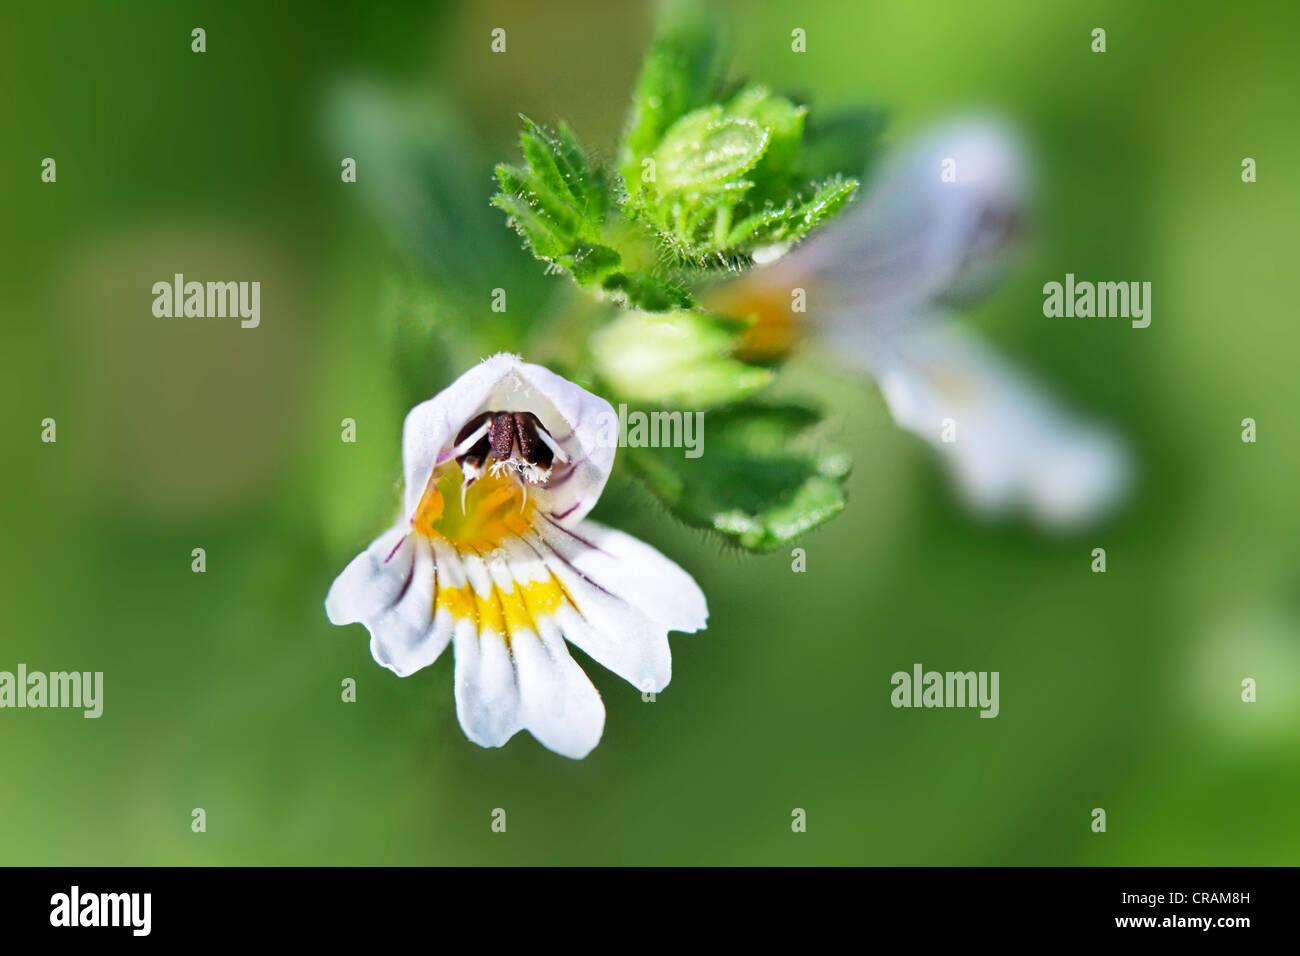 Blossom of the medical plant Eyebright (Euphrasia). - Stock Image